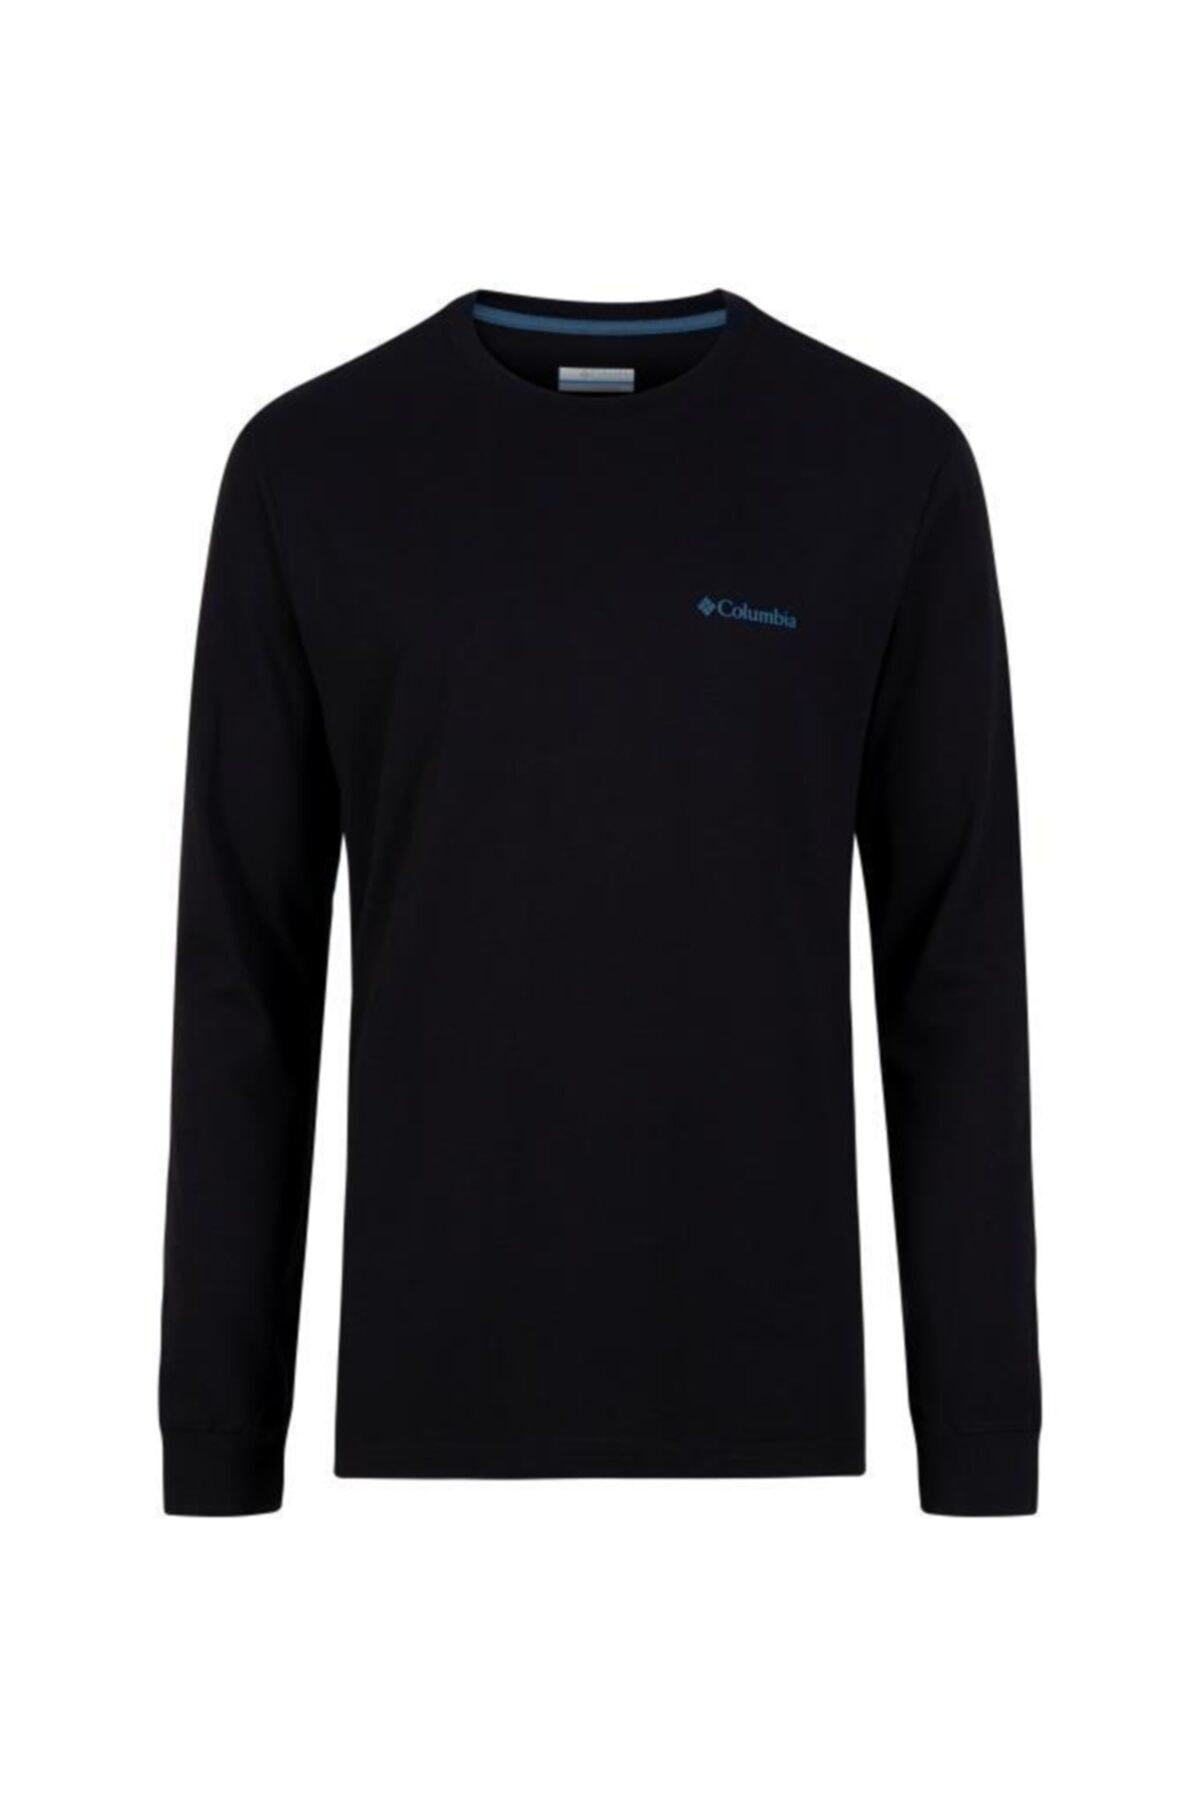 Columbia Cs0175 Csc Basic Erkek Sweatshirt 9110060010 2